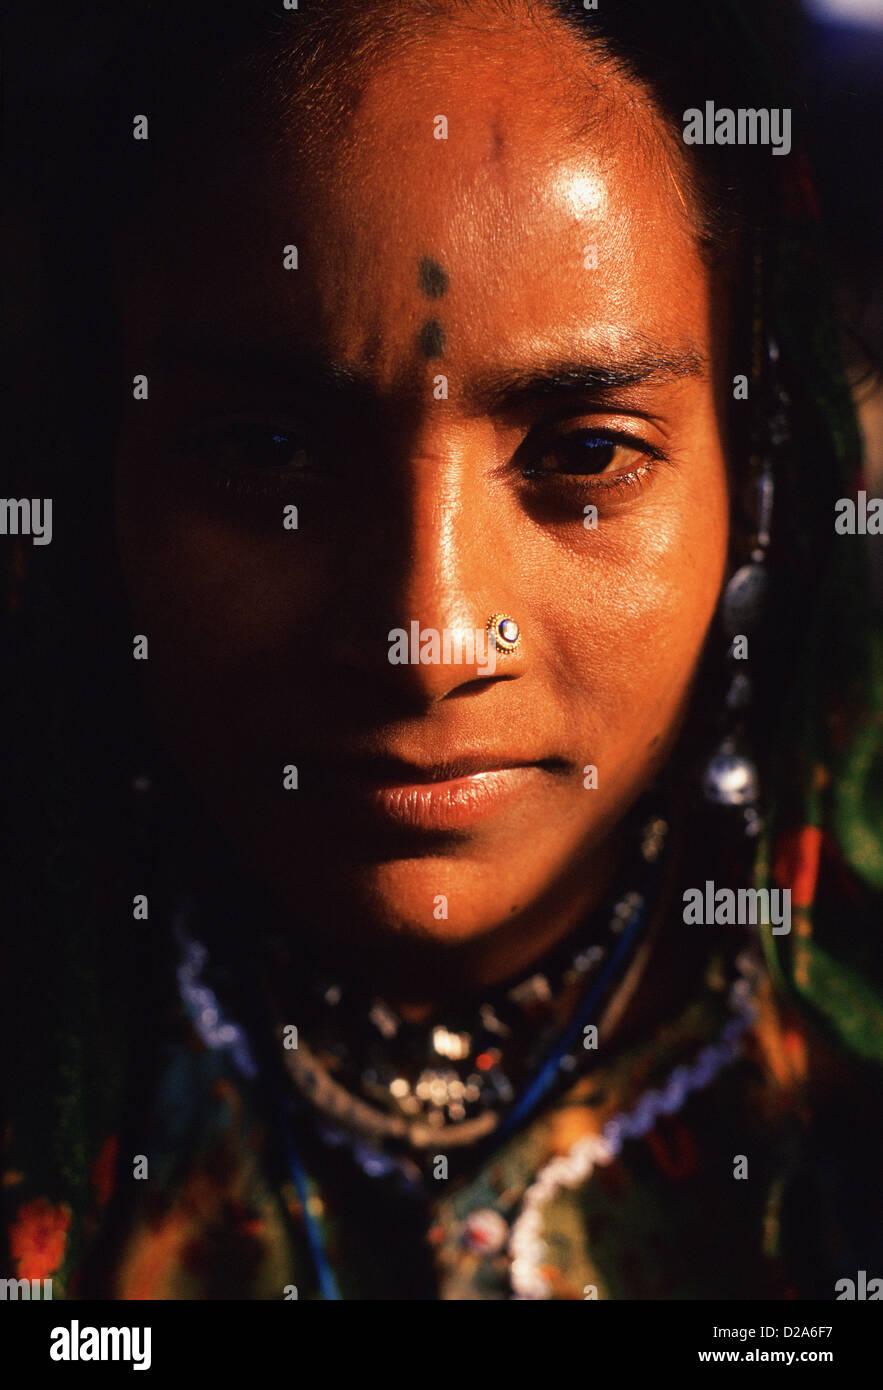 Woman belonging to the Gaduliya Lohar caste ( India) - Stock Image